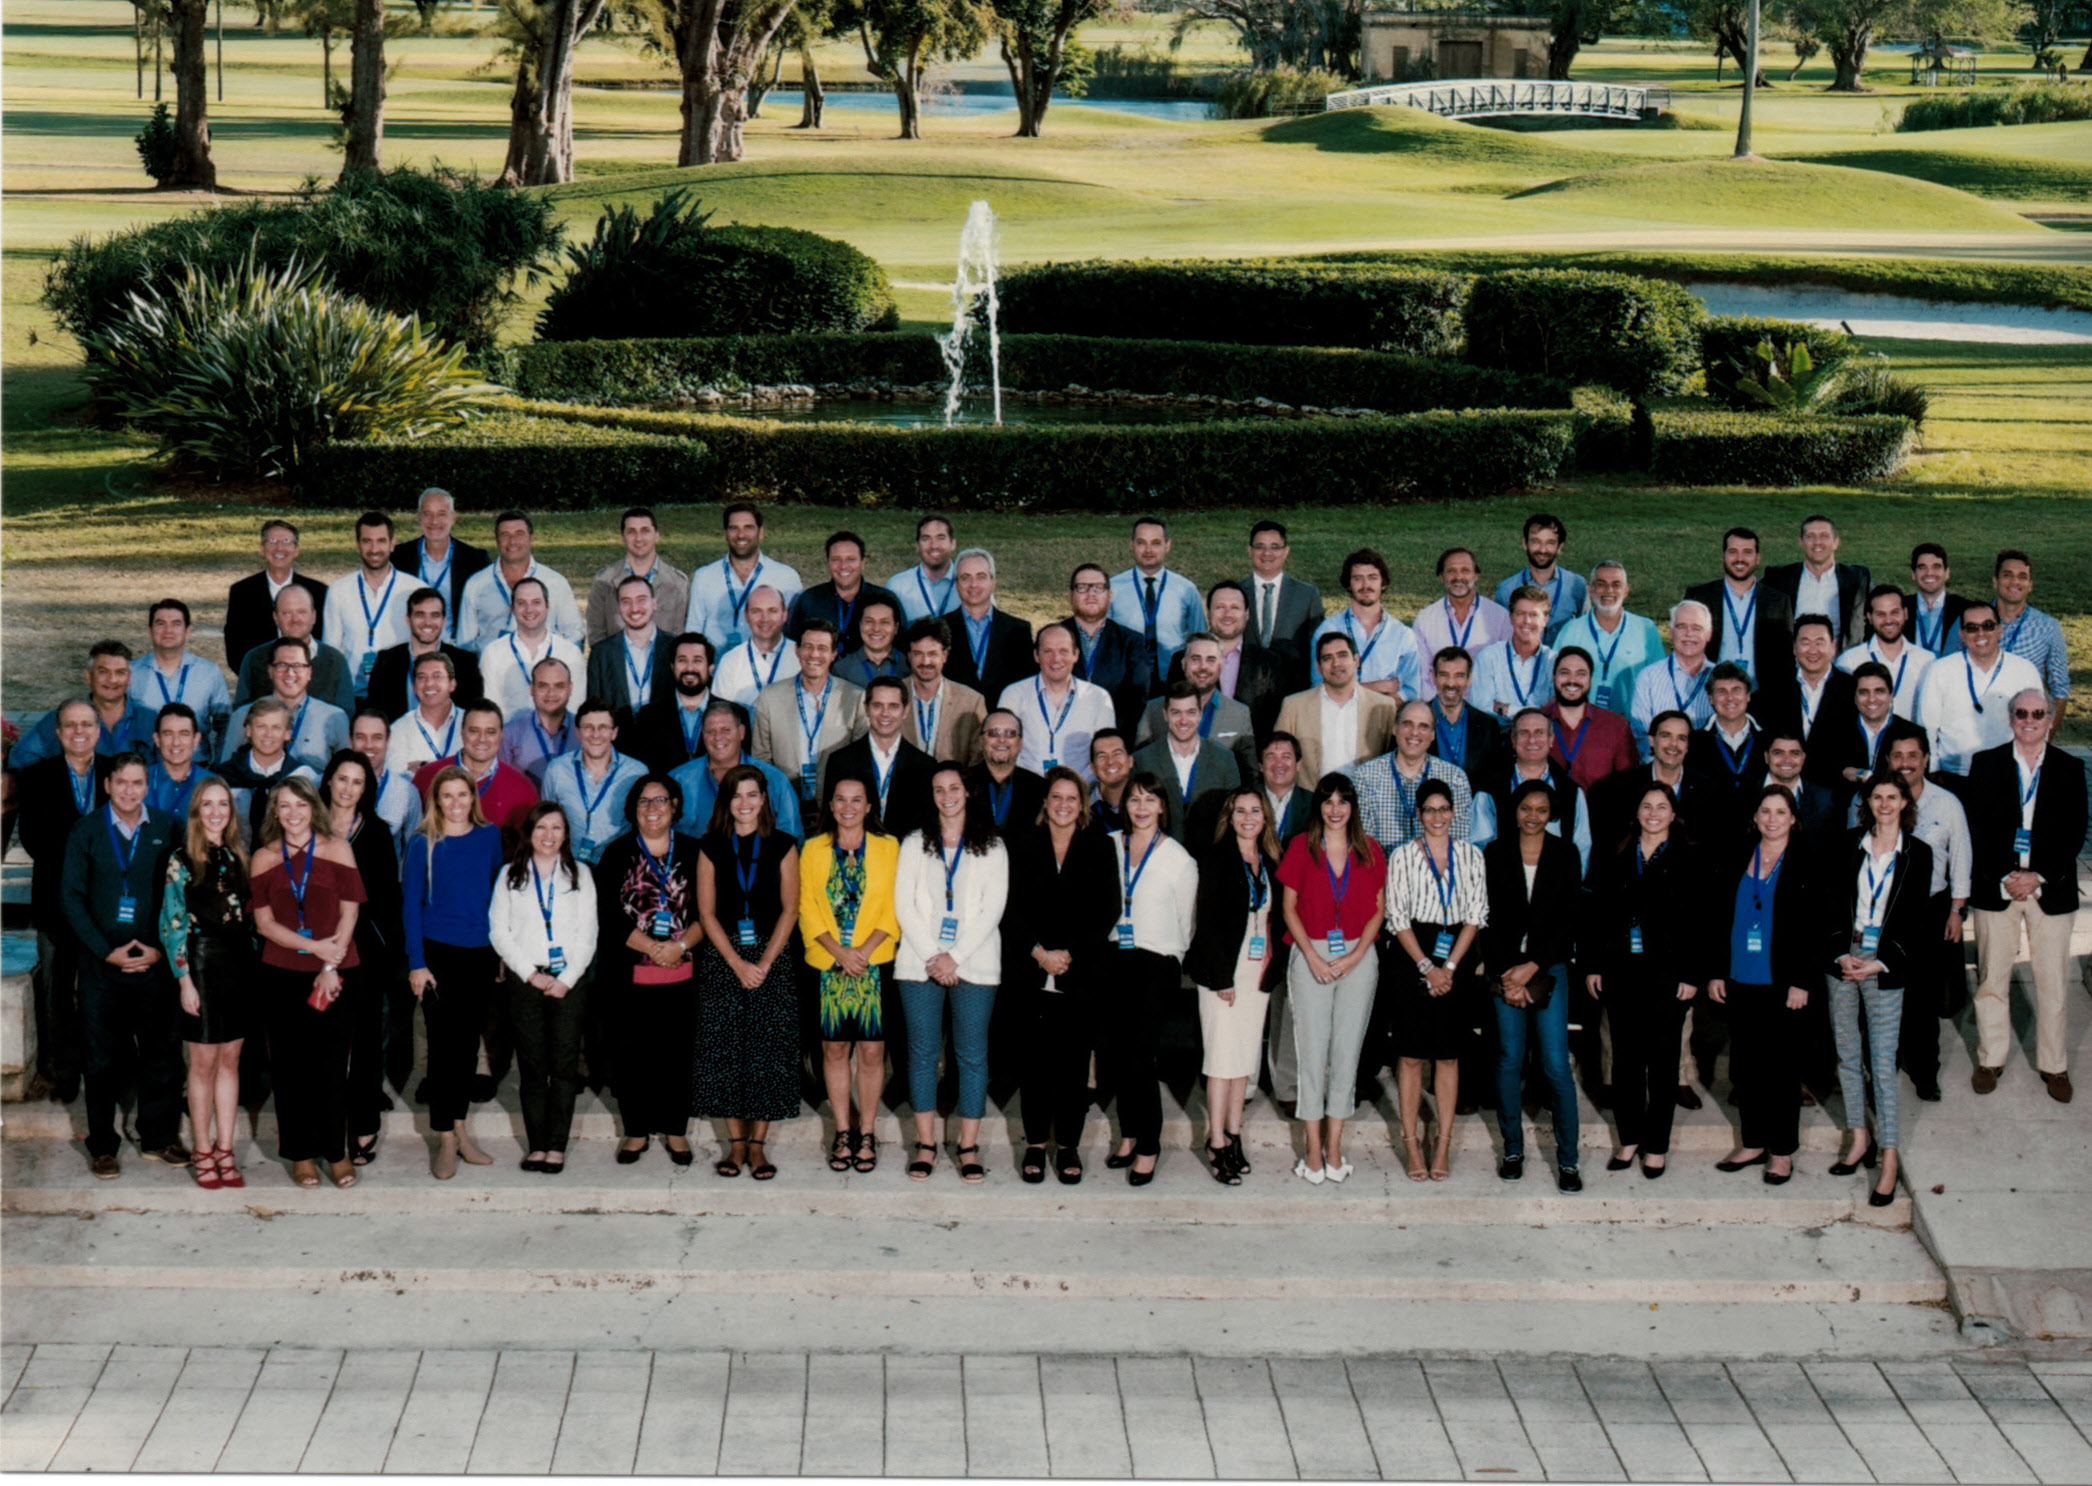 Innovation Technology Advisory Board 2018 (ITAB)